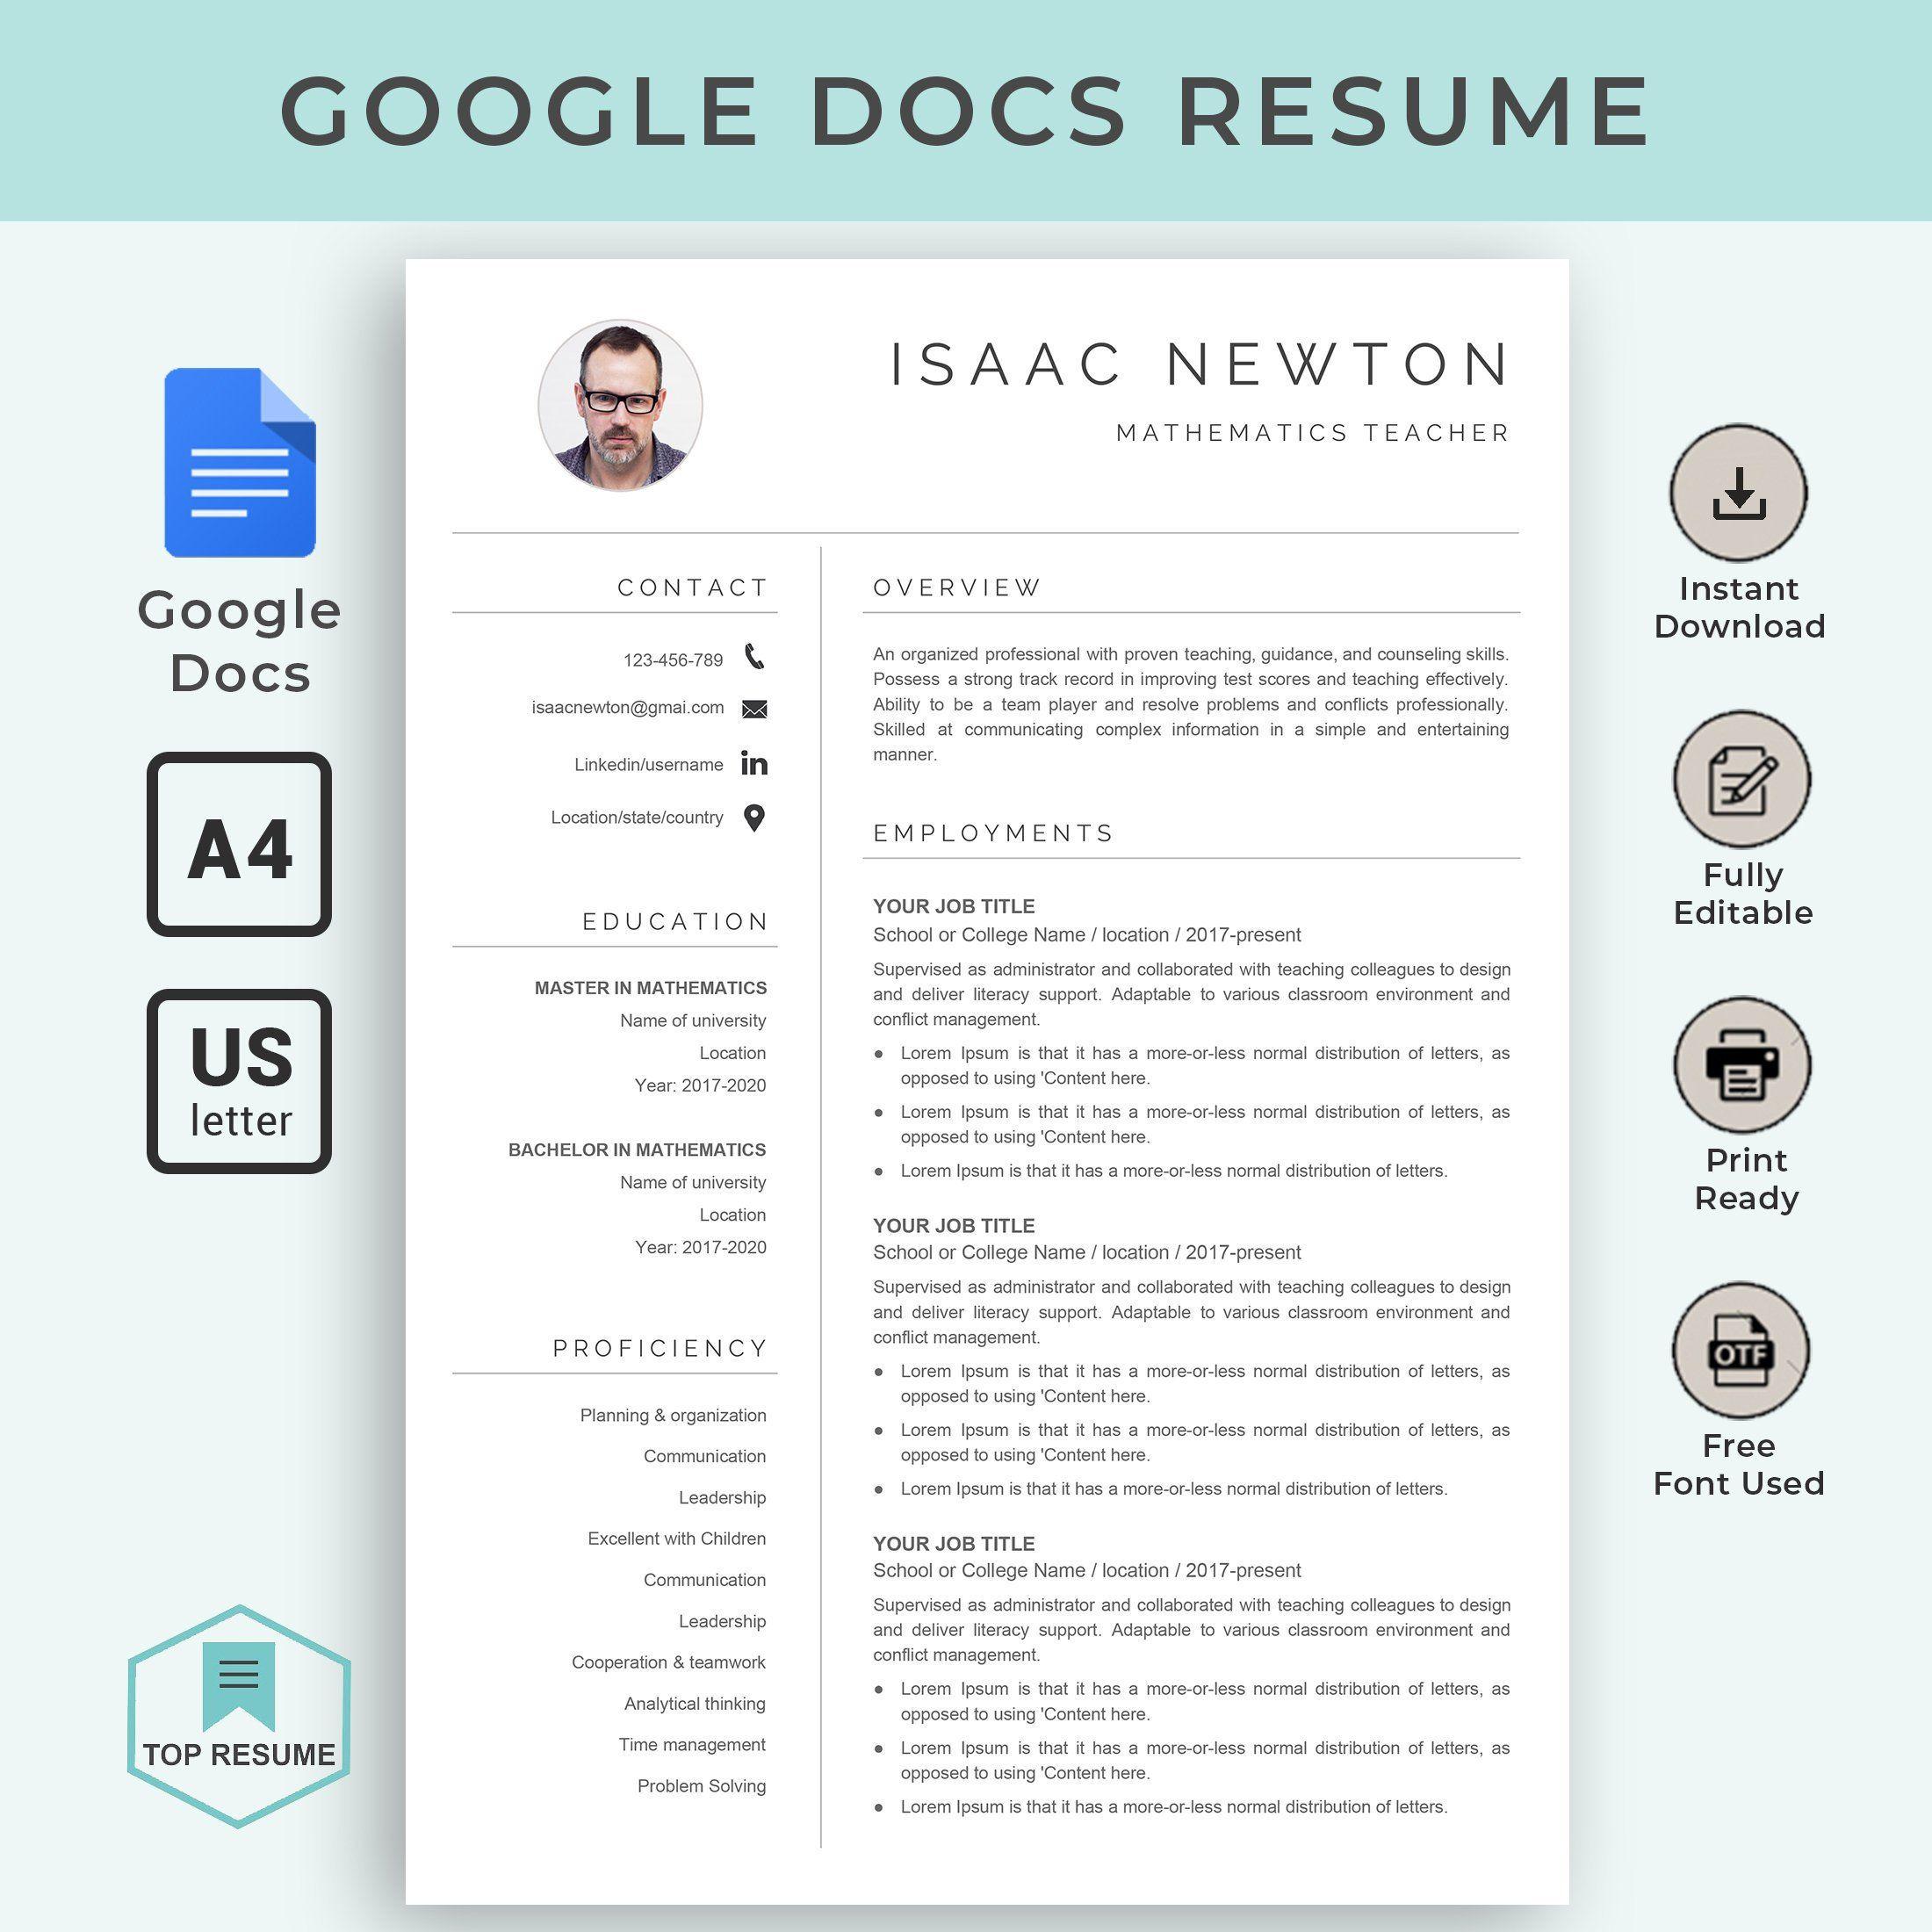 Google Docs Resume Google Docs Resume Template Teacher Resume